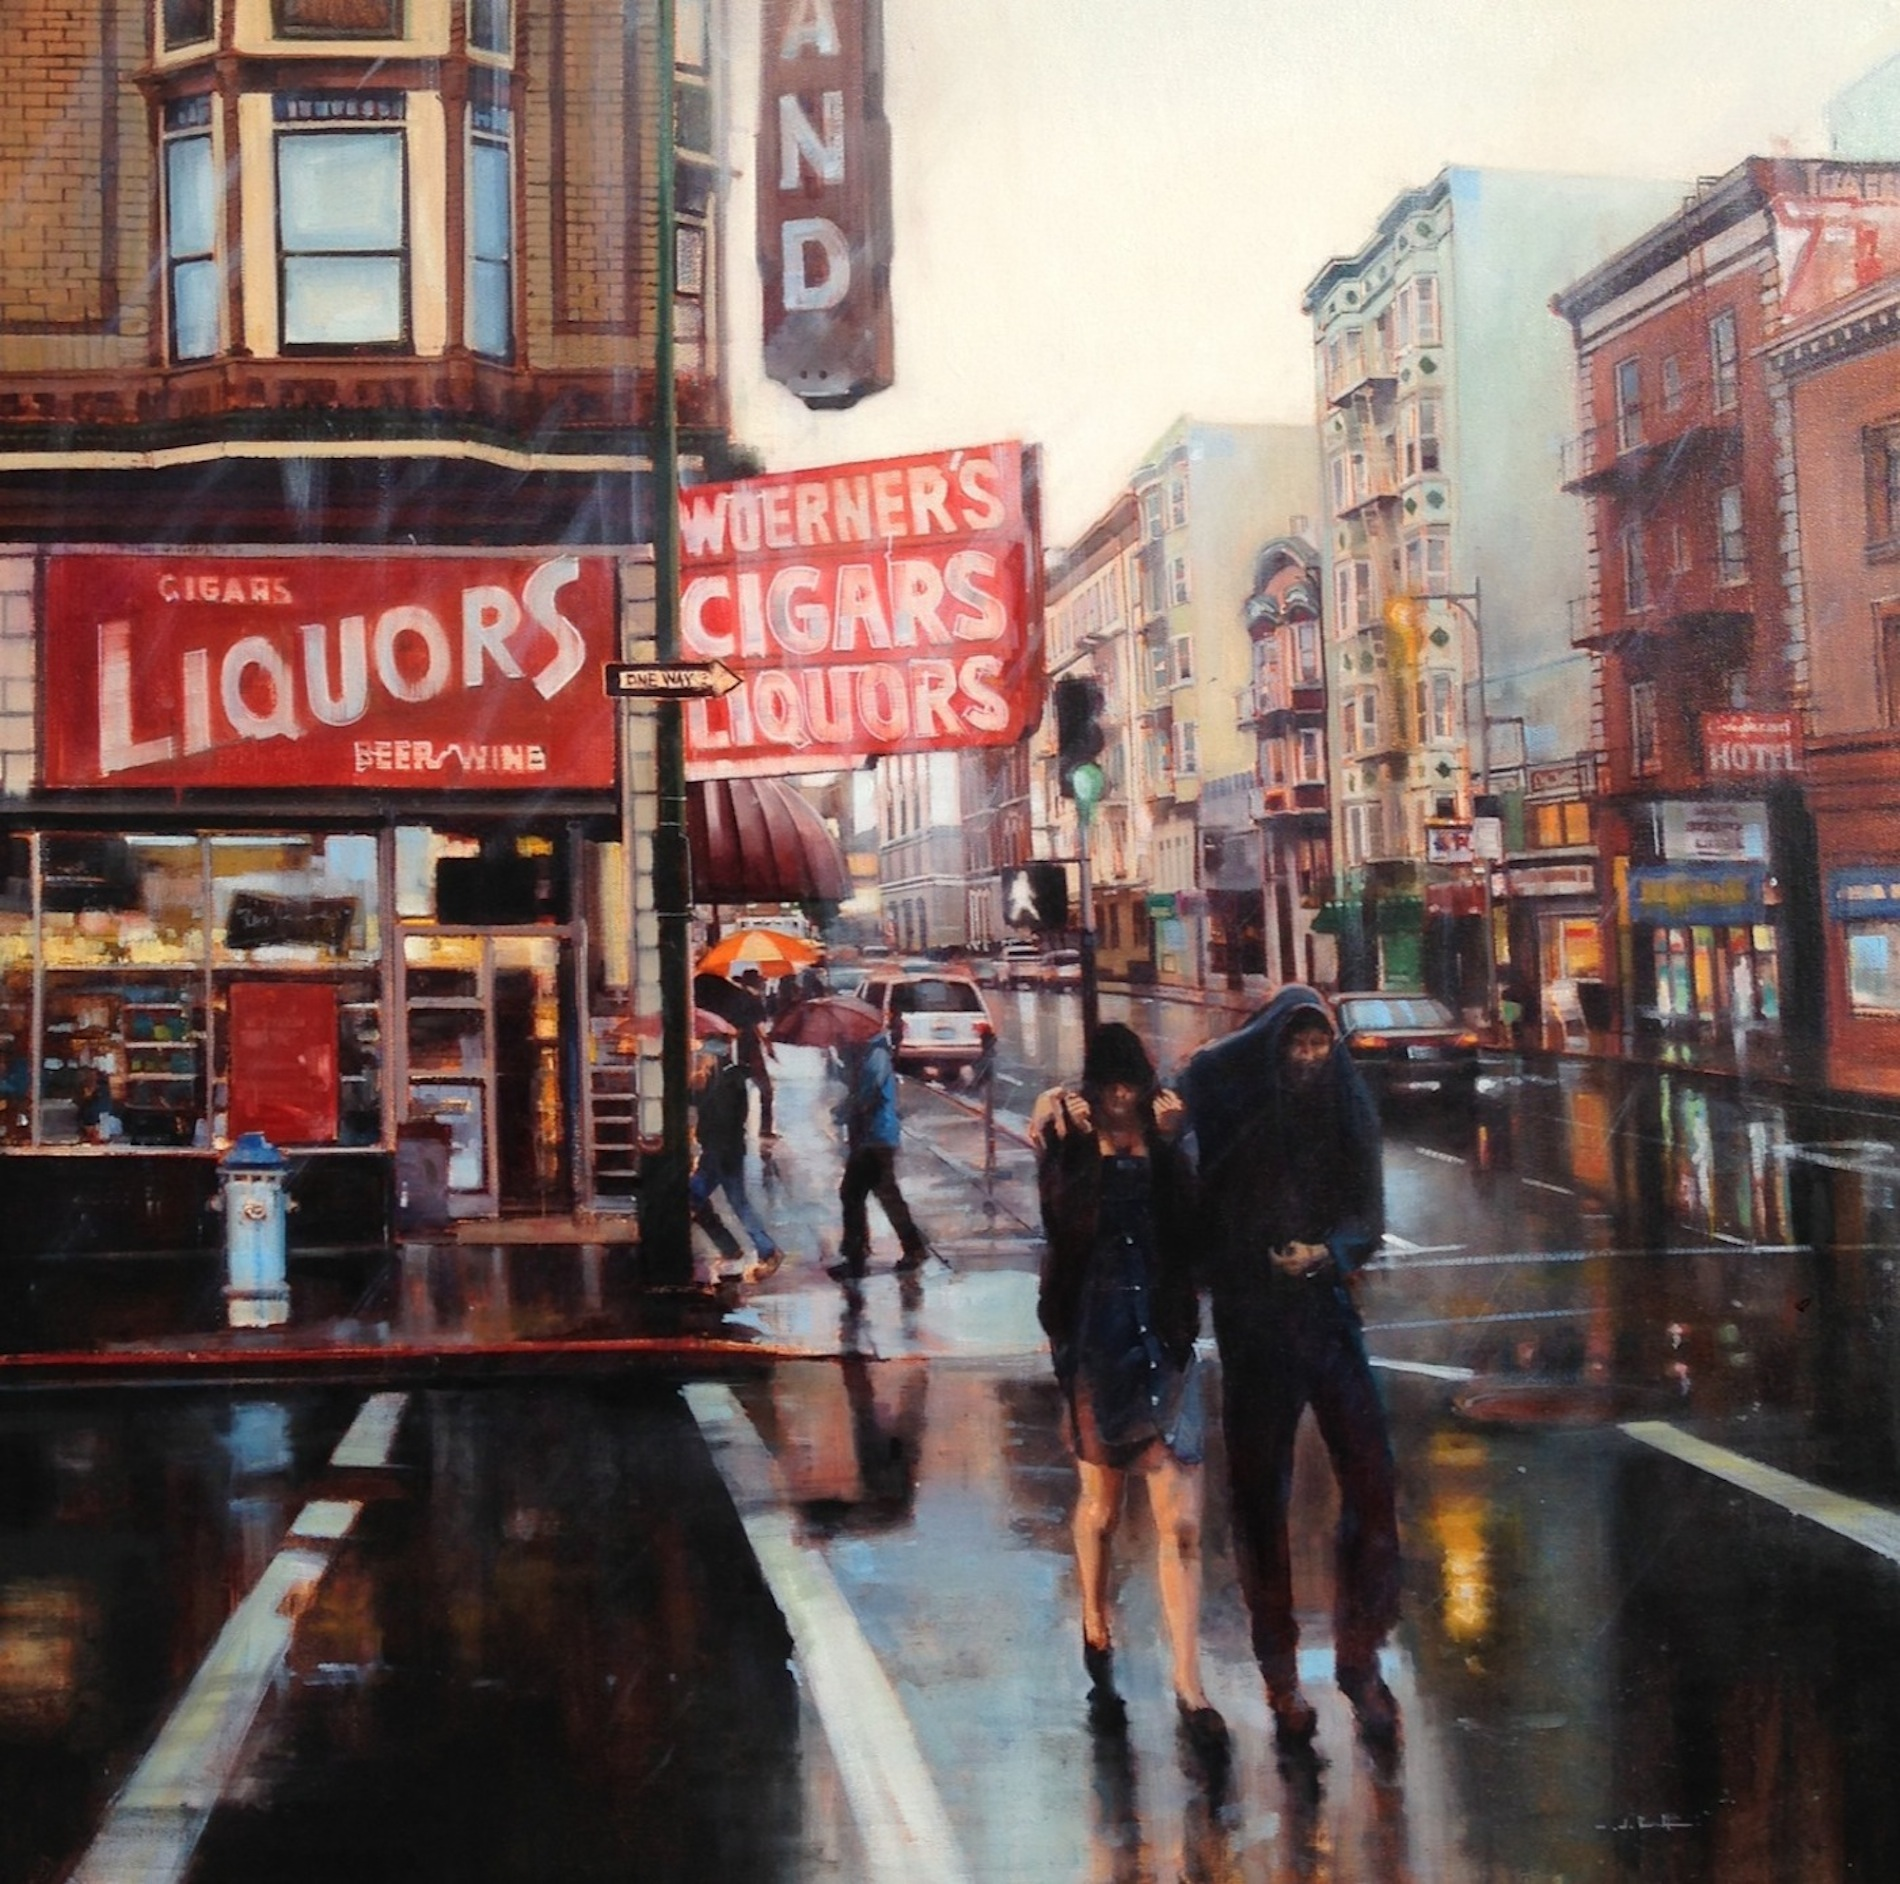 City Liquor